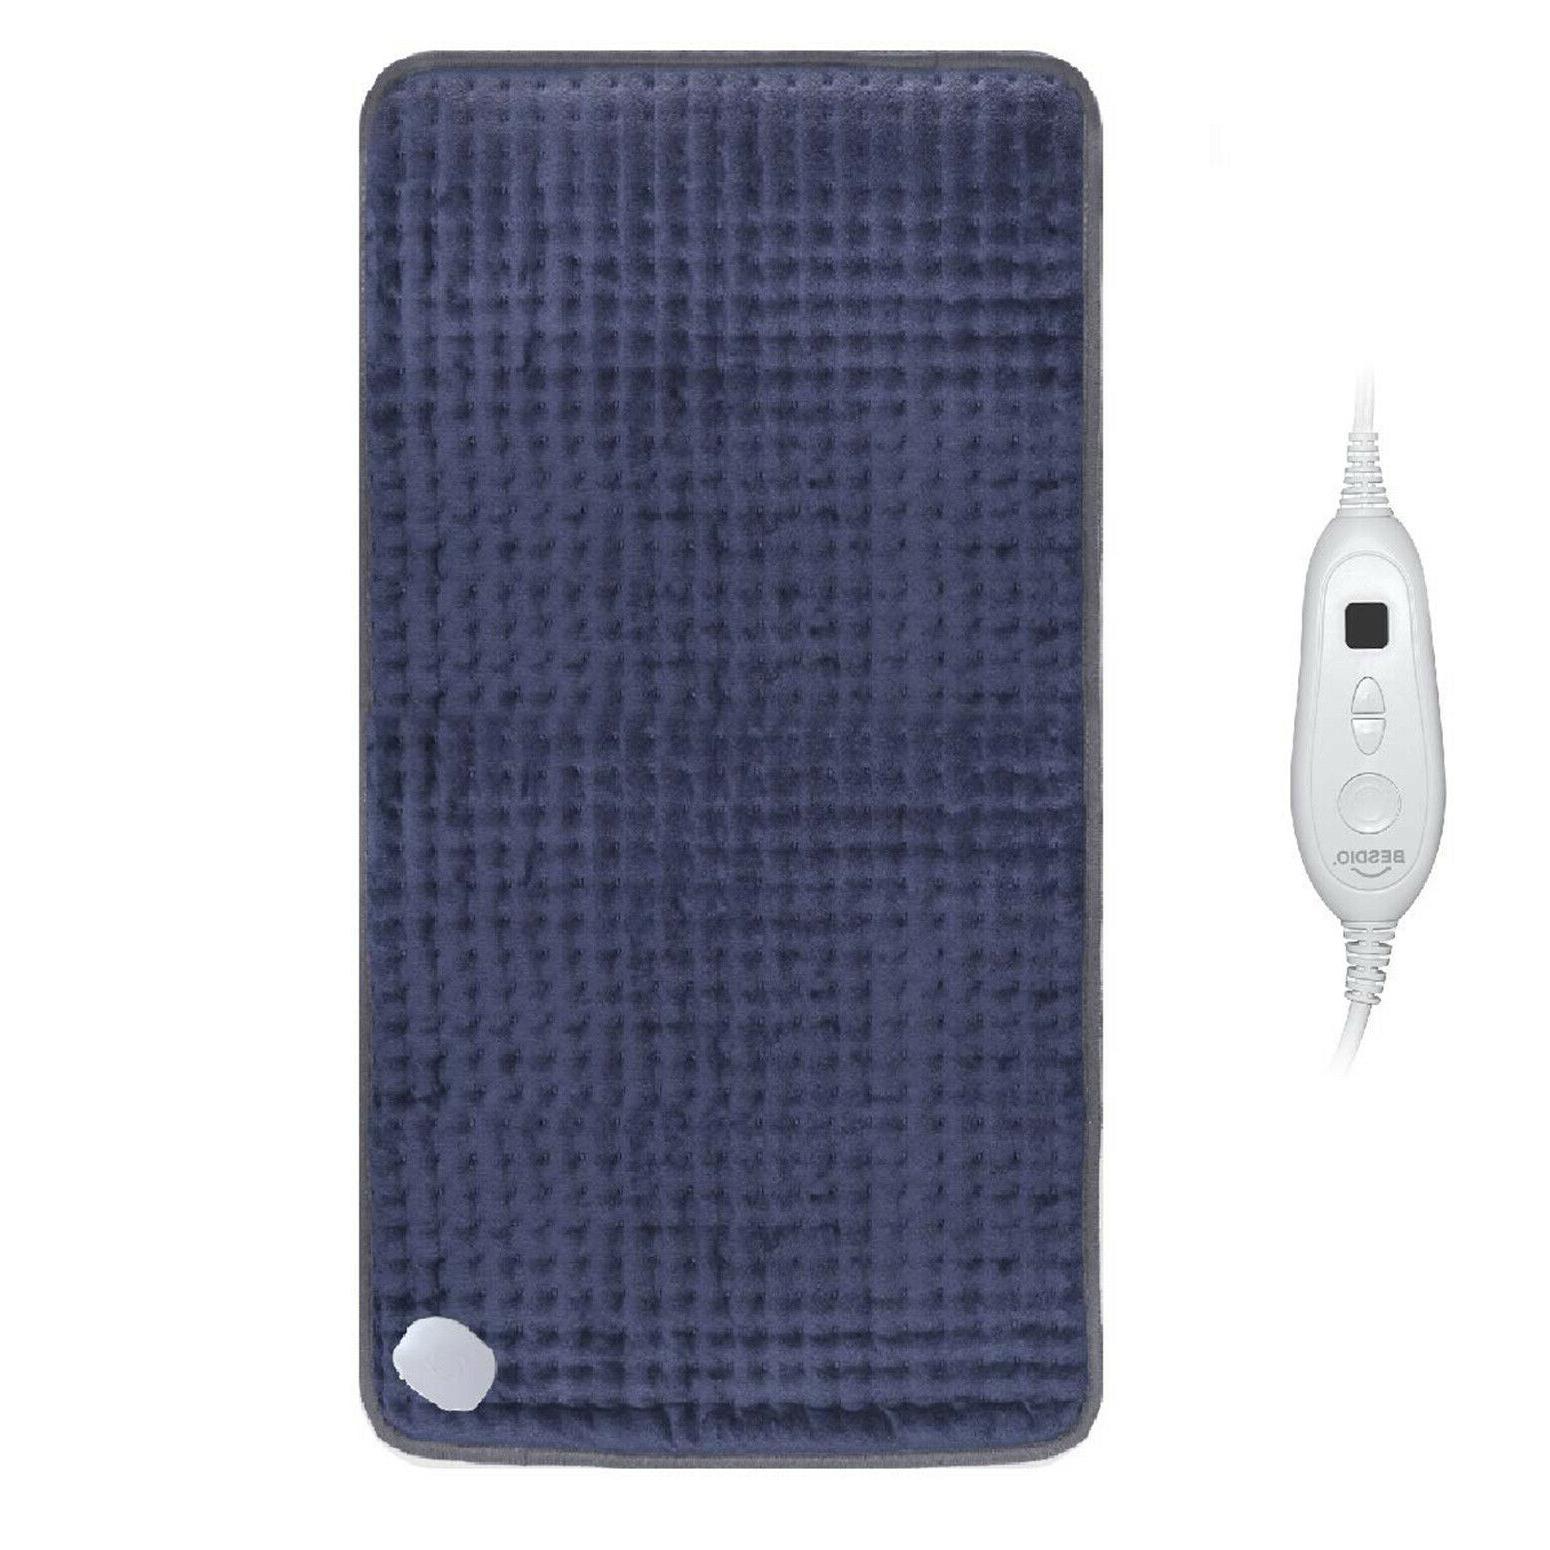 xxx large heating pad gift set